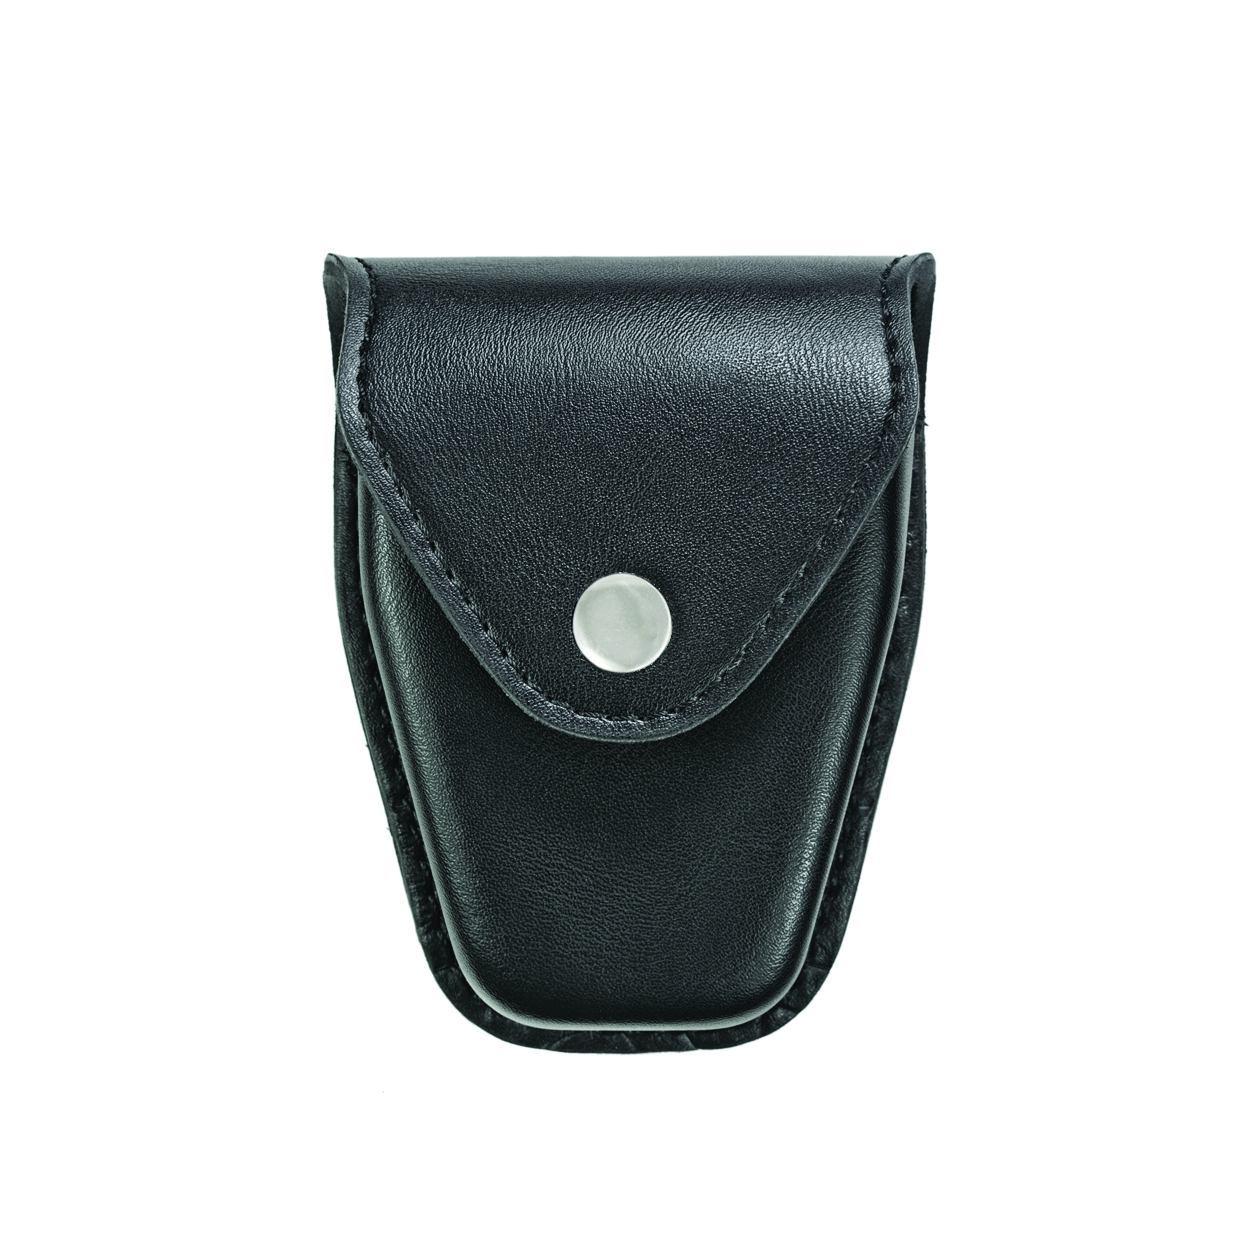 Handcuff Case, Double, Reg & ASP™ Chain, AirTek, Smooth, Nickel Snap-Hero's Pride